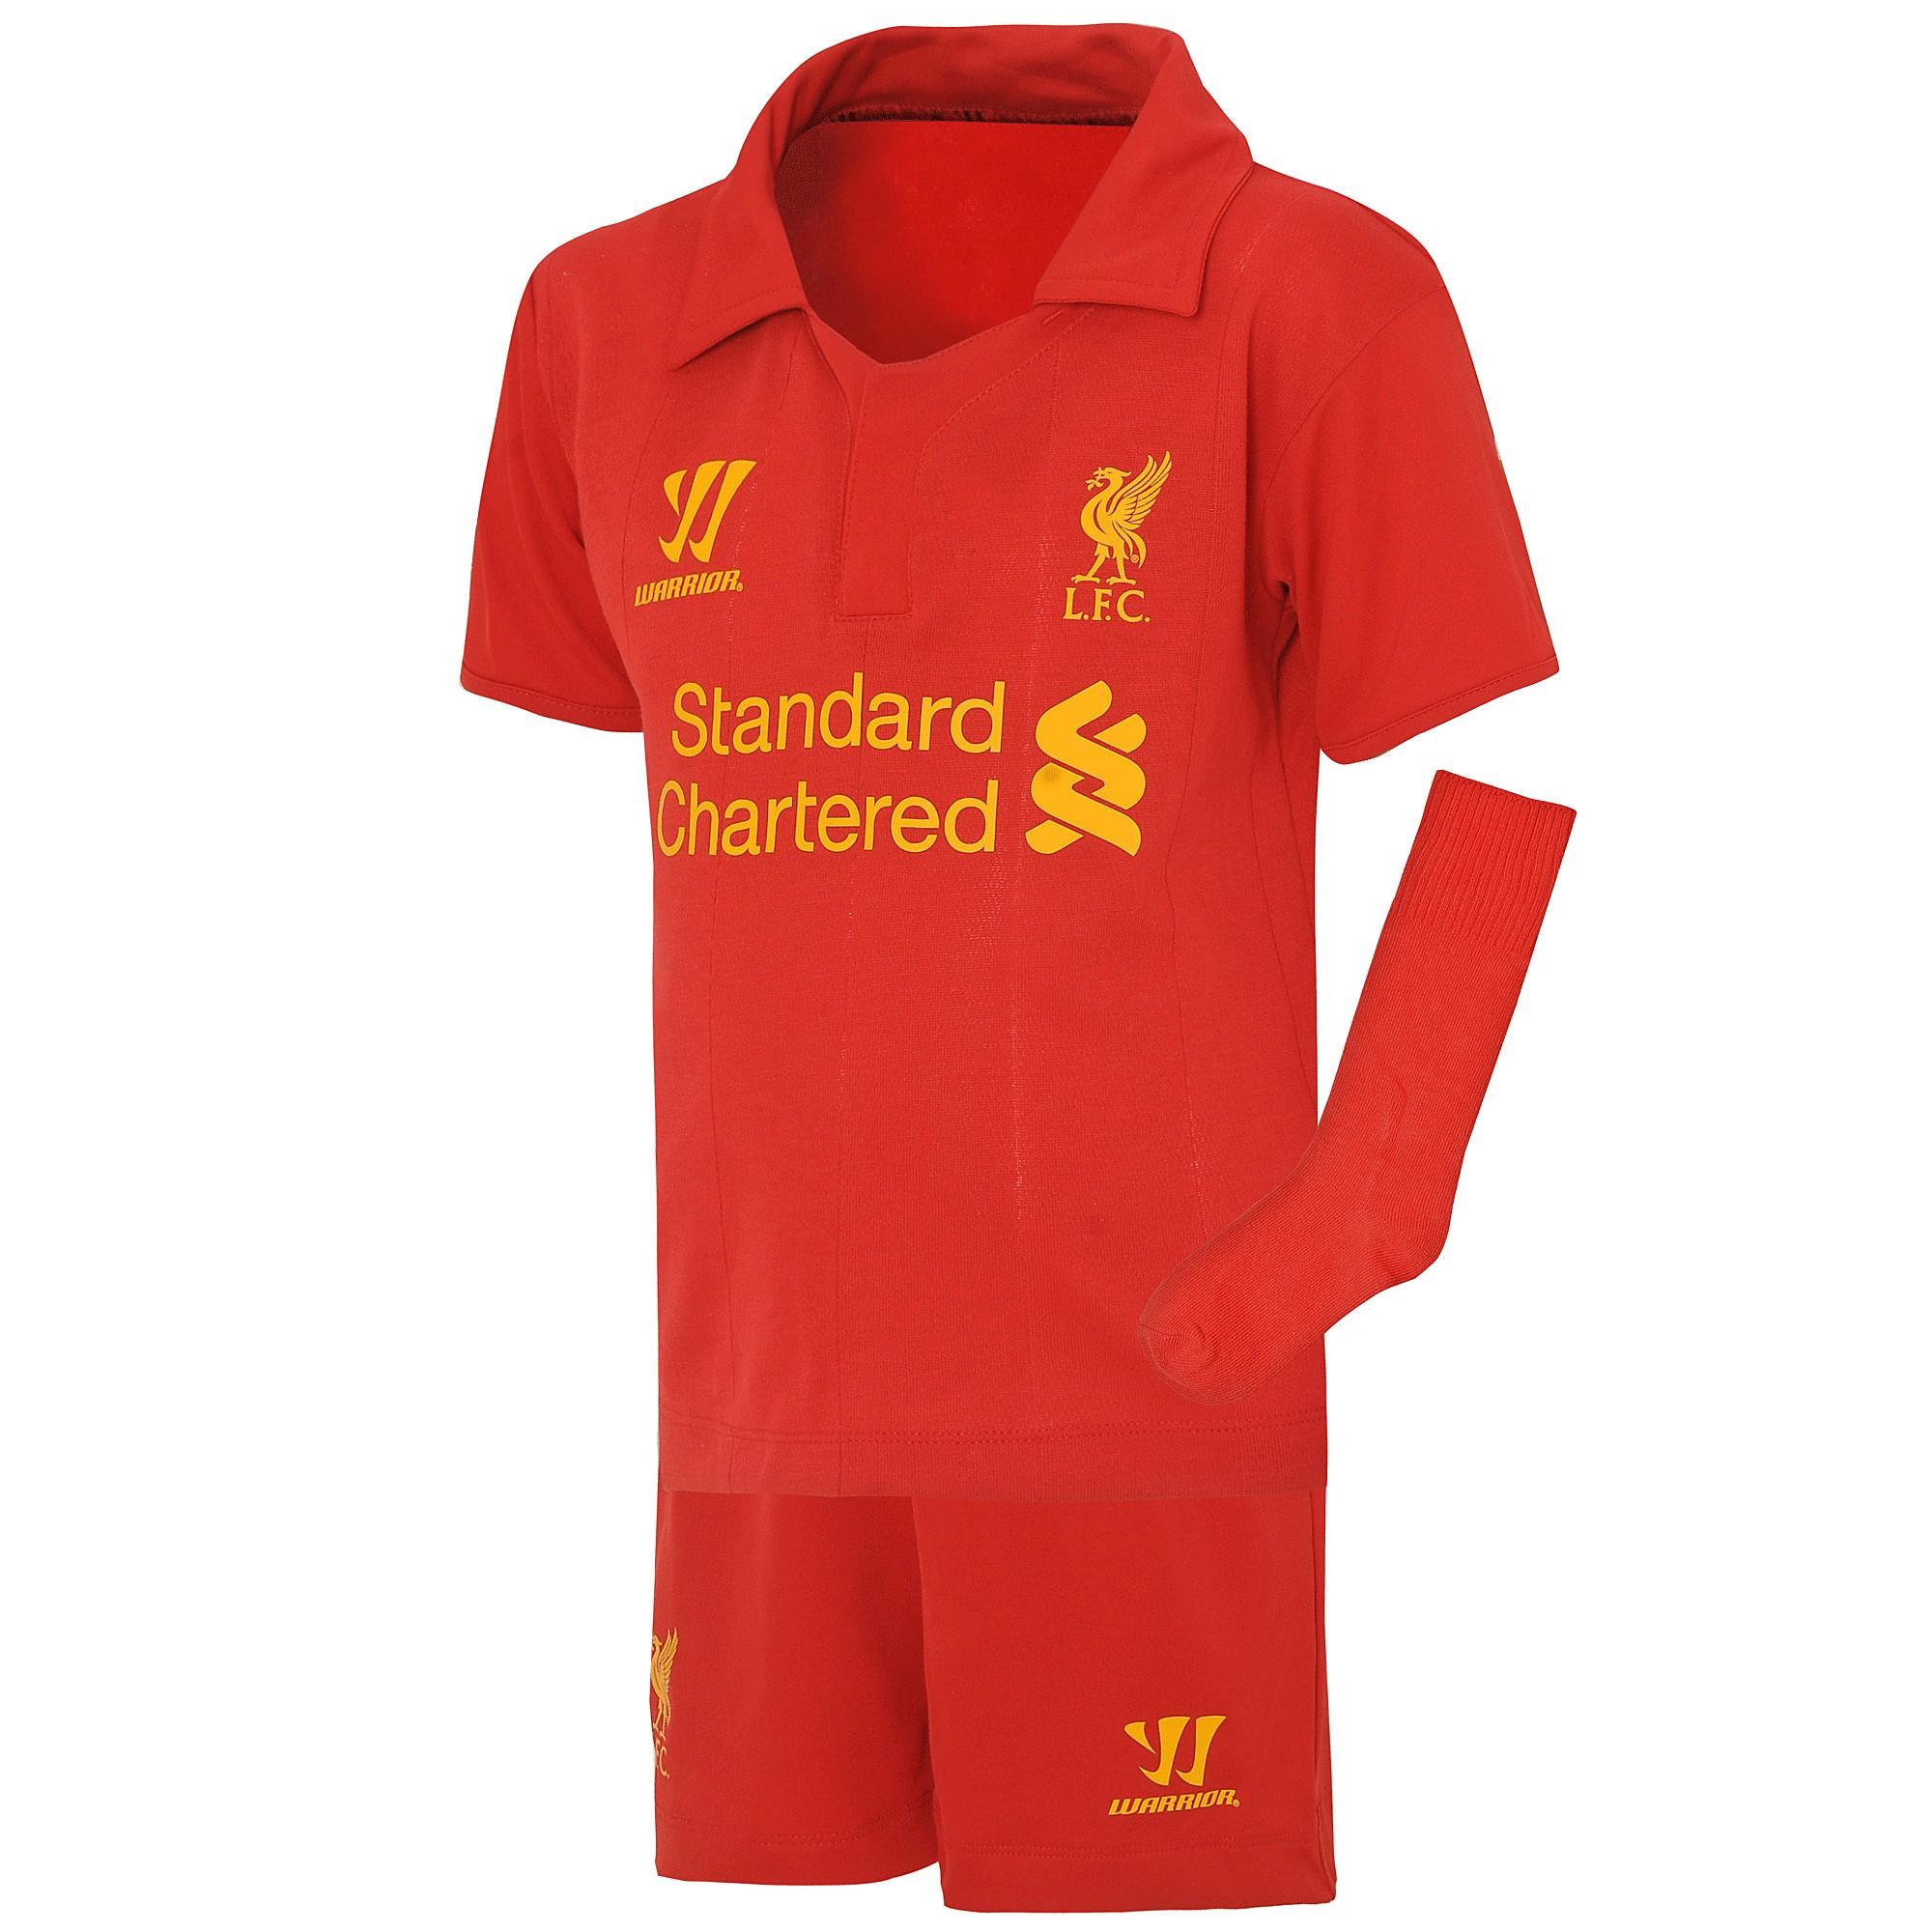 Warrior Sports Liverpool Home Kit 2012/13 Childrens